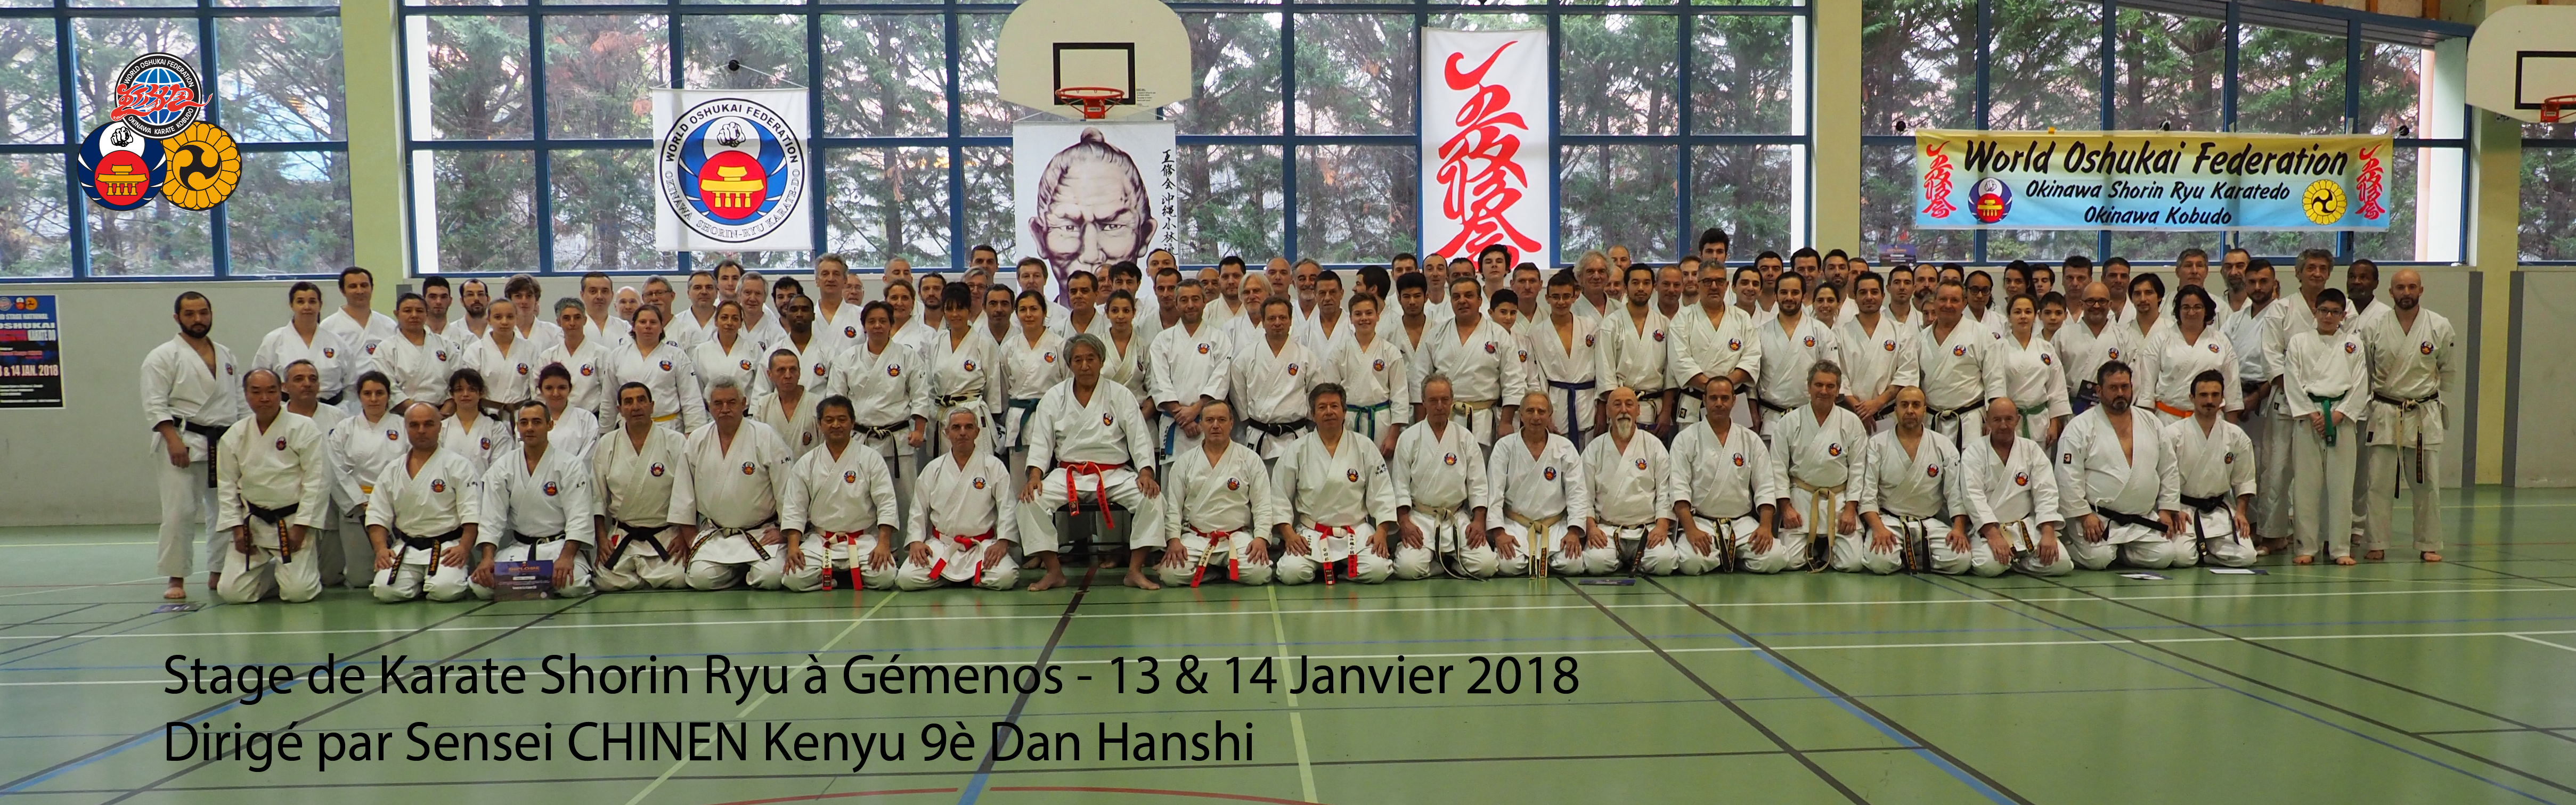 Grand Stage National de Karate Shorin Ryu